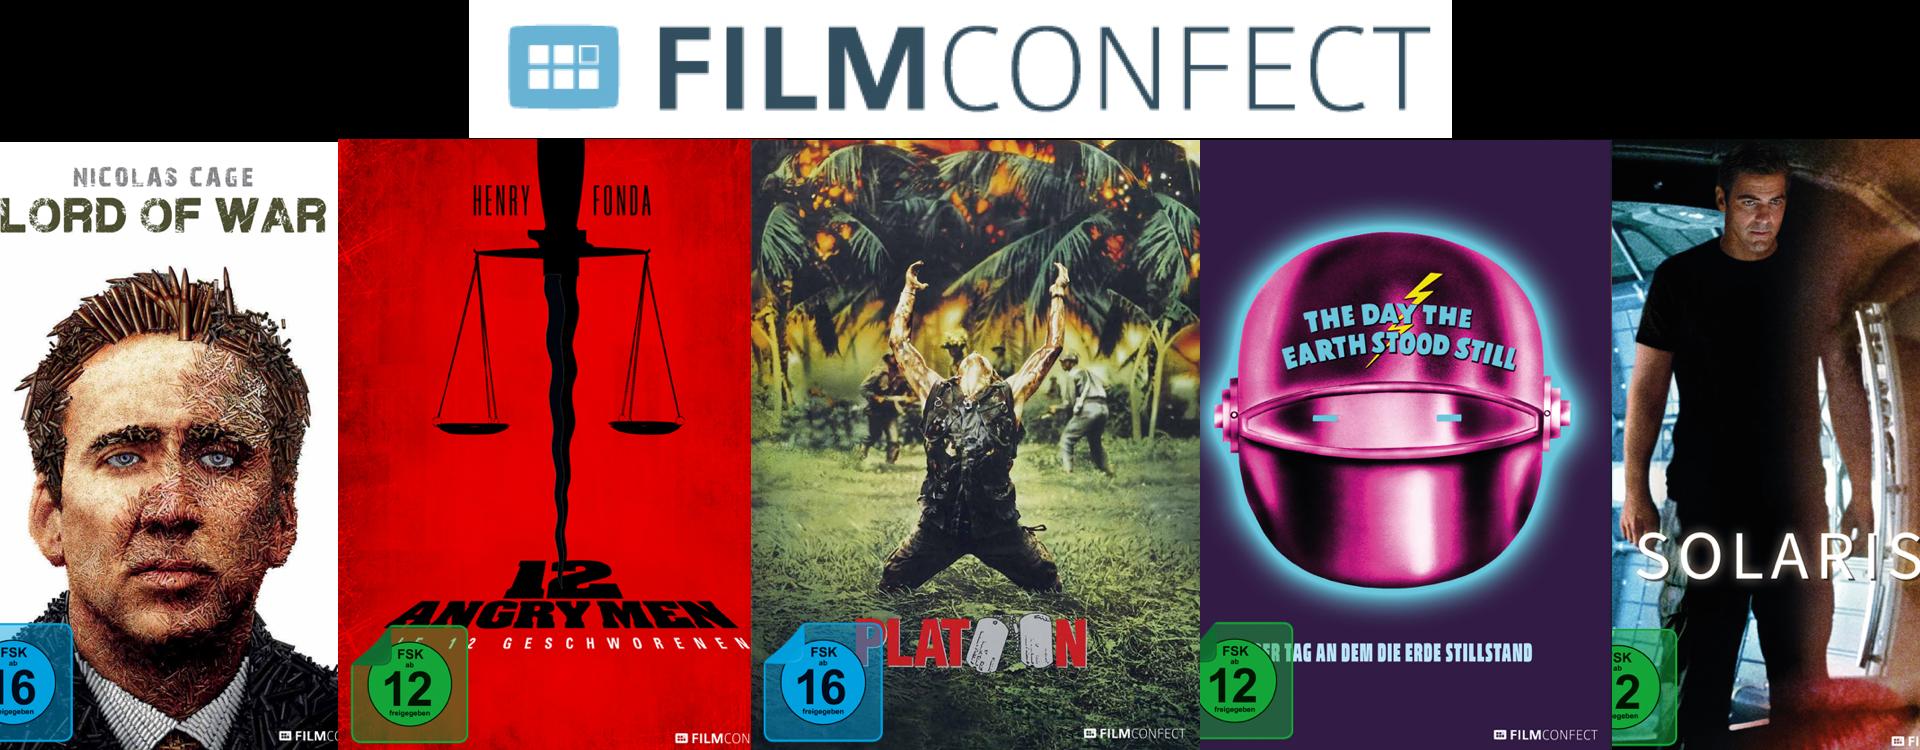 Exklusiv bei Müller - FilmConfect Mediabooks